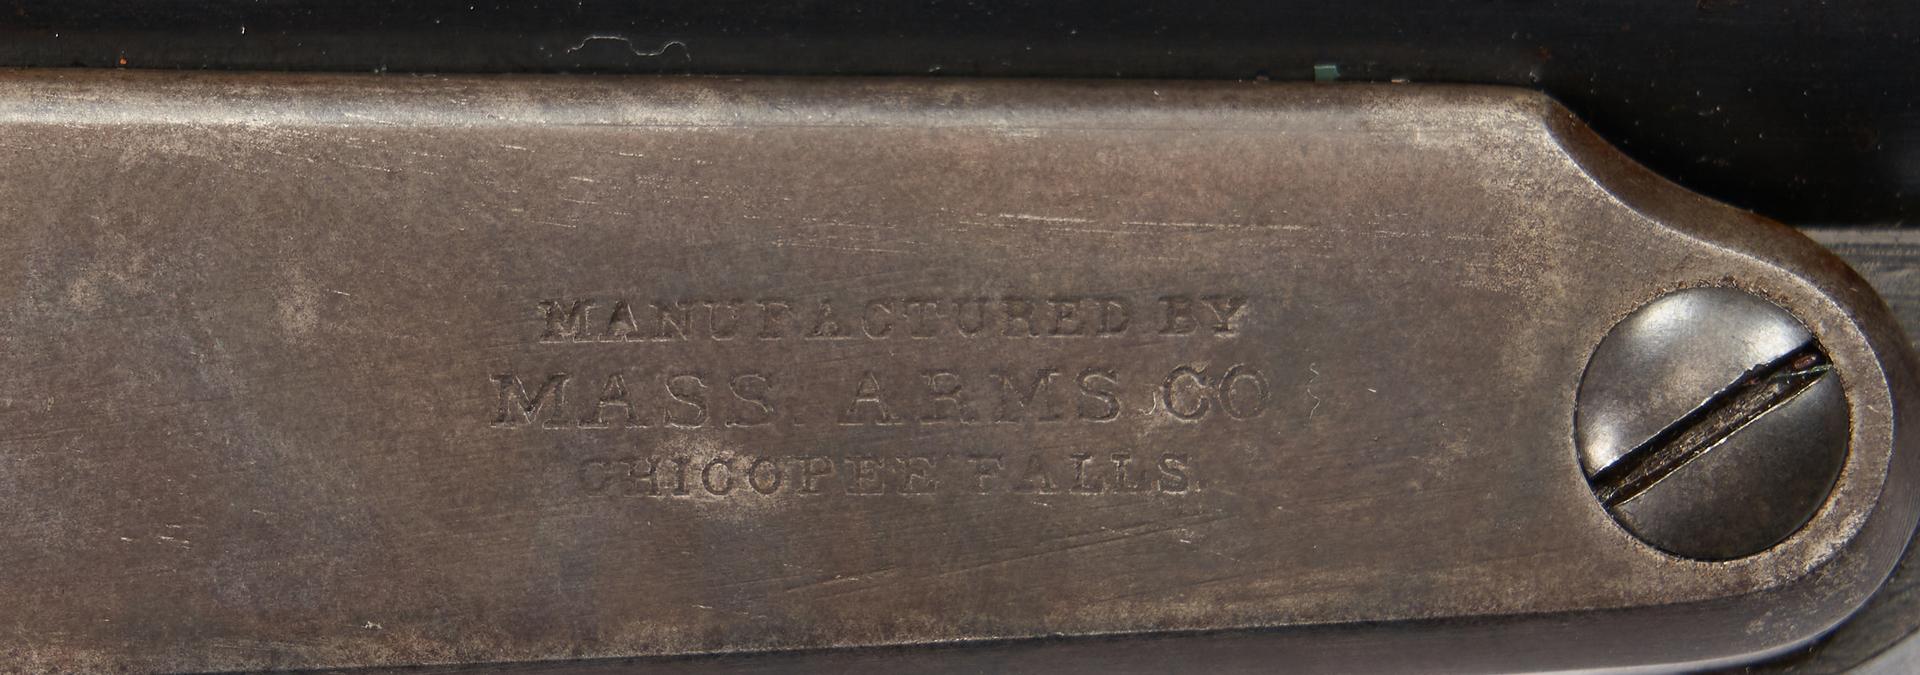 Lot 703: Civil War Mass. Arms Co. 2nd Model Lever Action Carbine, .50 cal.